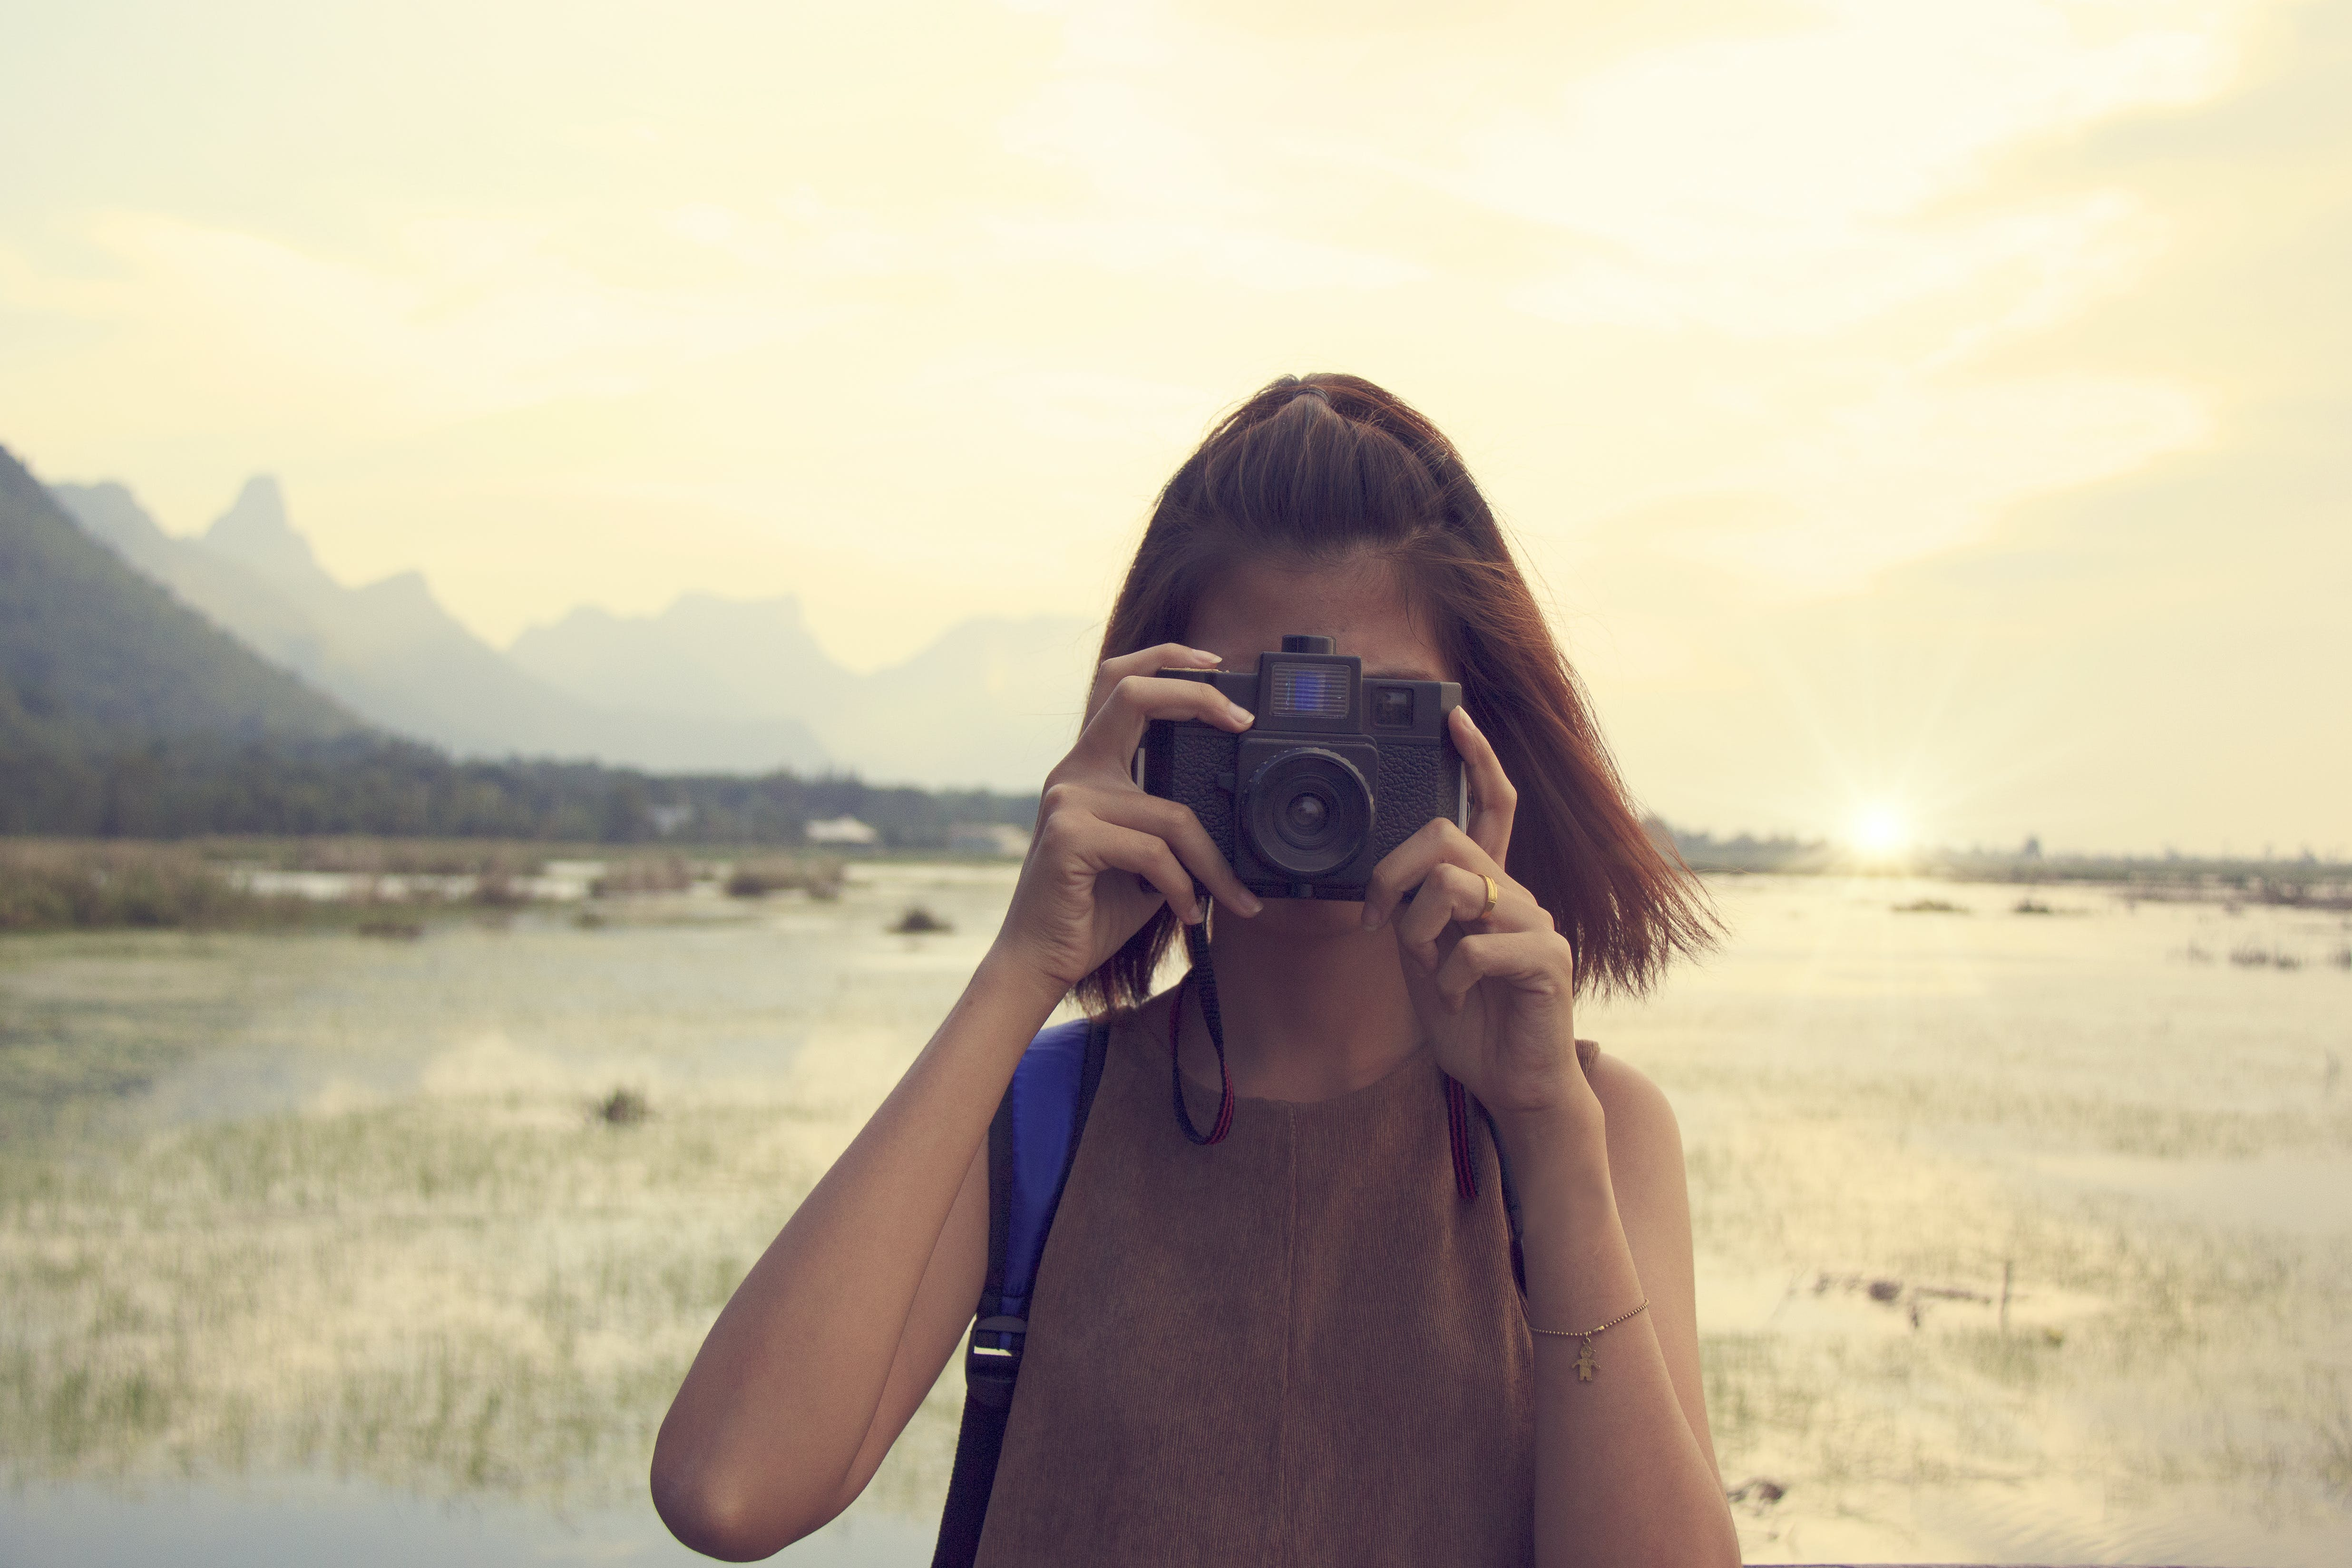 Gratis stockfoto met bergen, camera, cameralens, close-up